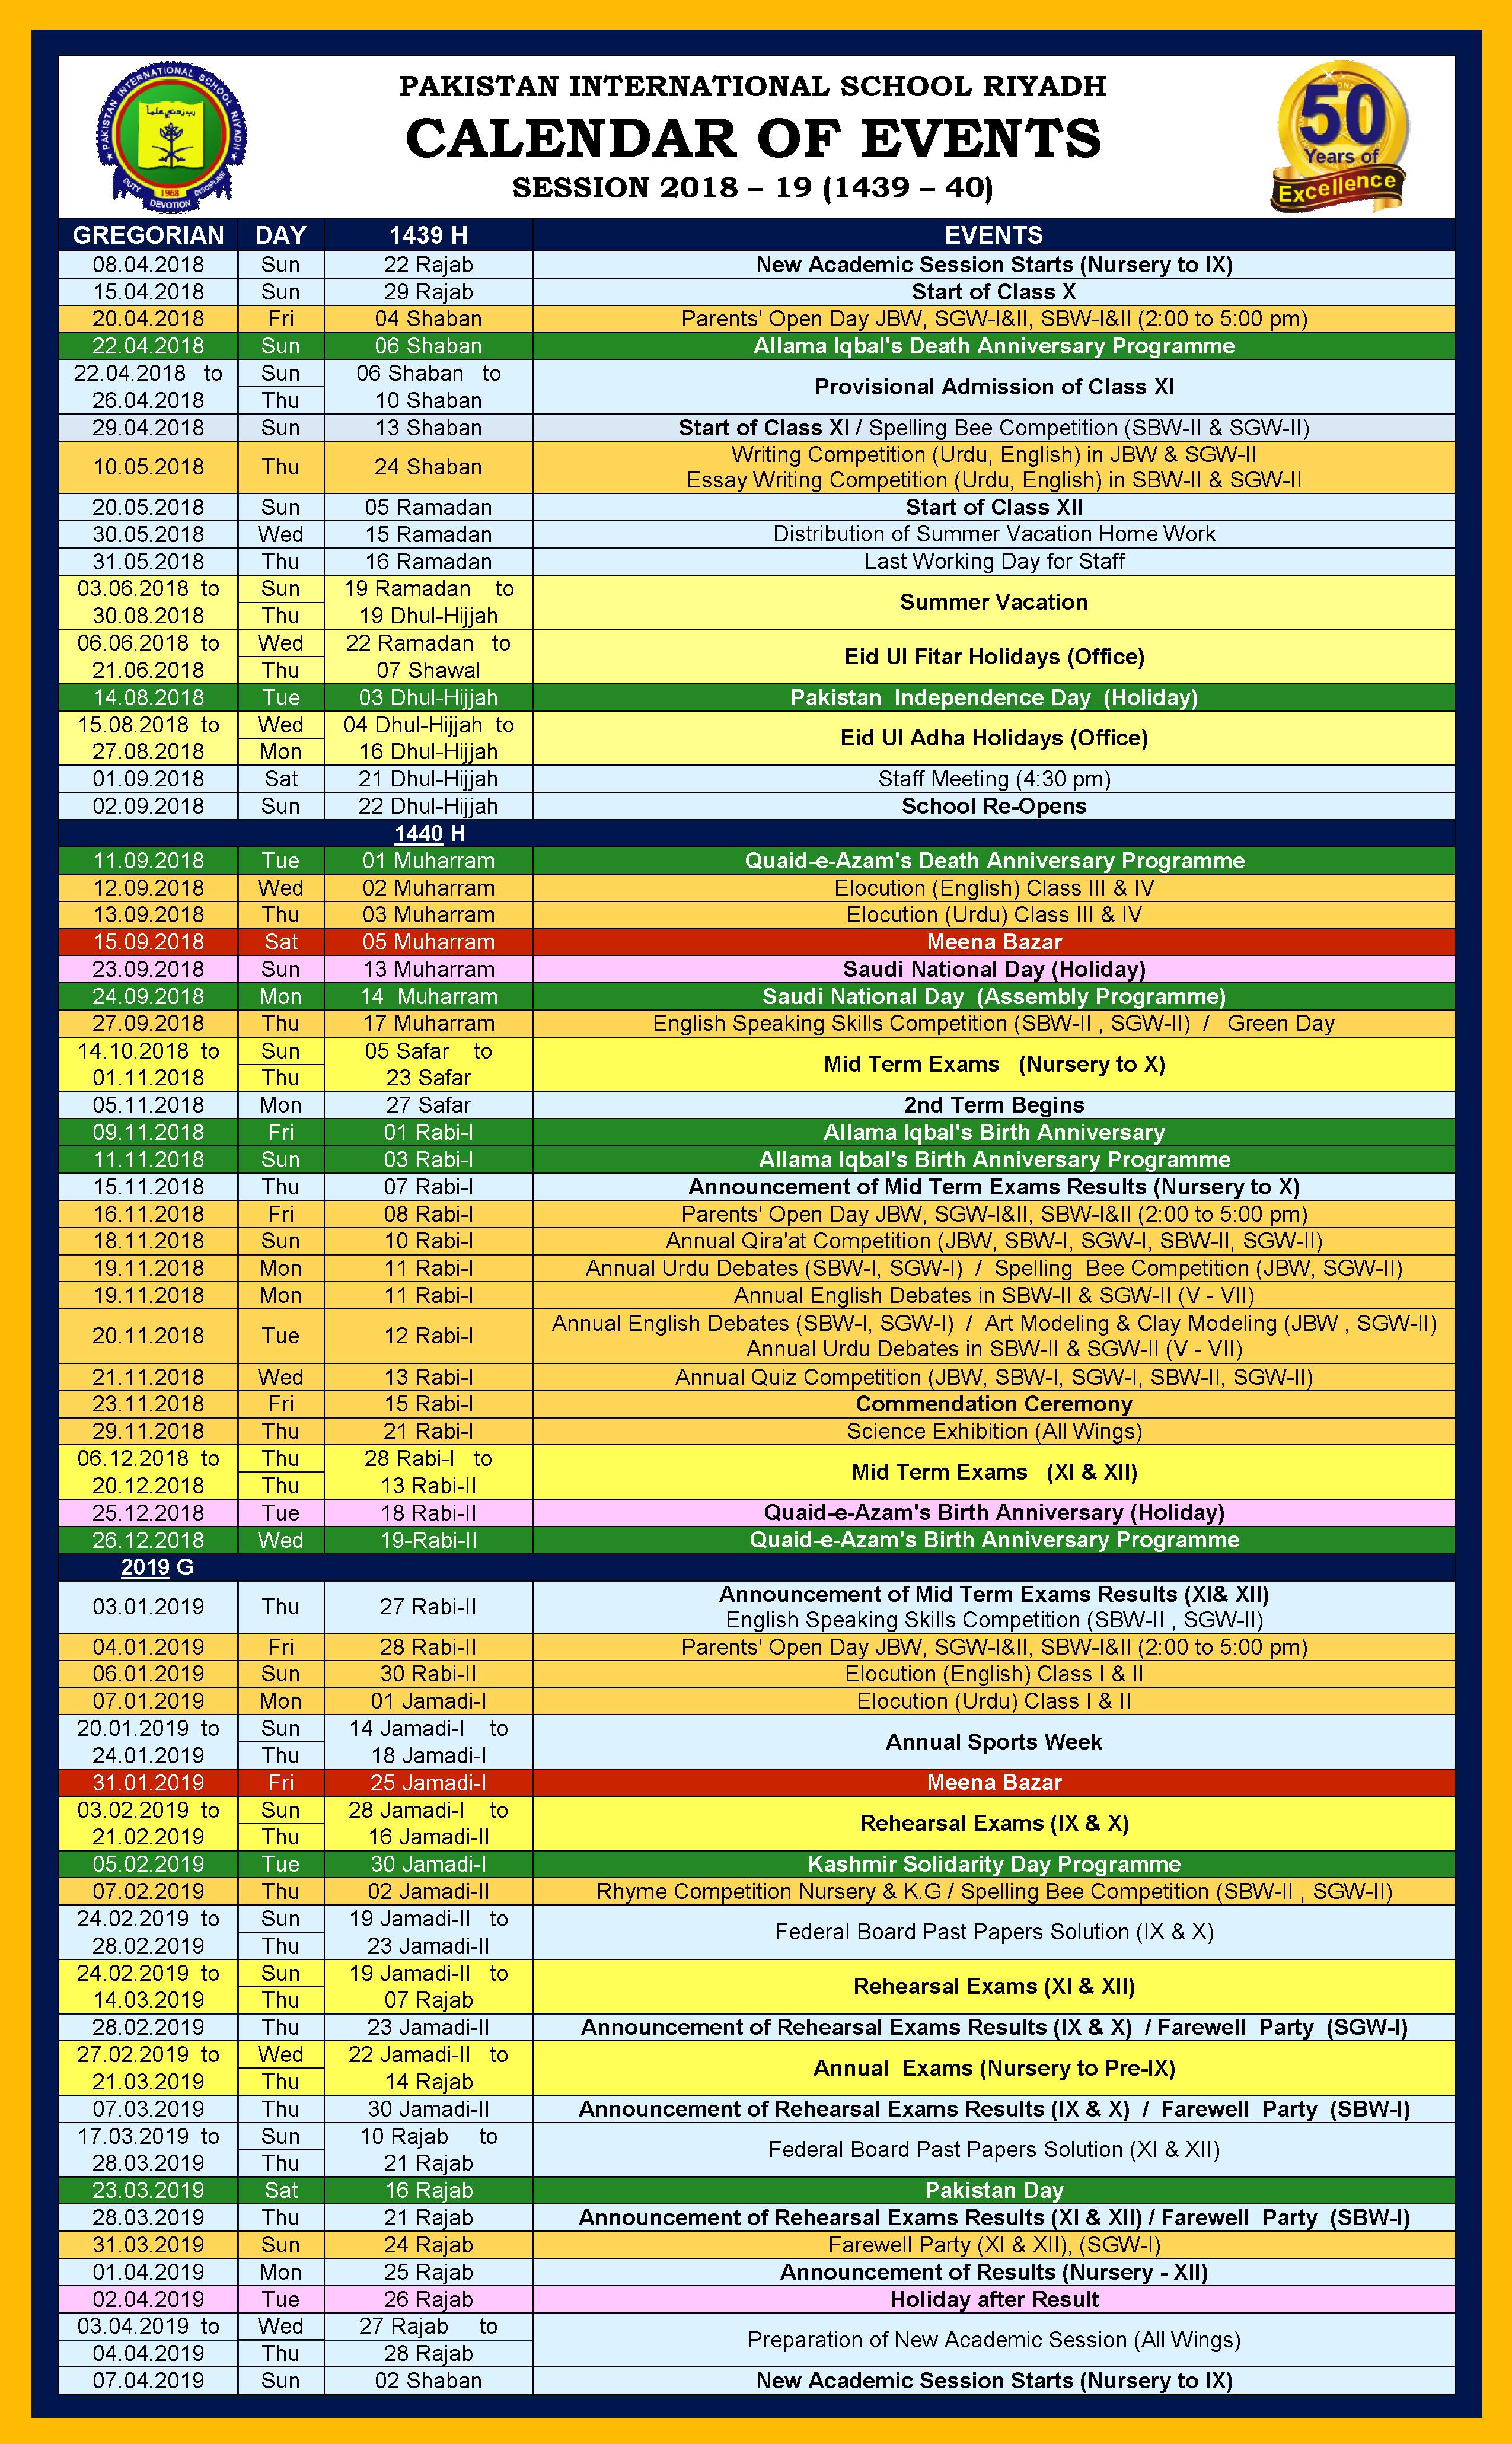 Dhul Hijja 2019 Calendrier.Academic Calendar Of Events 2018 2019 Pakistan